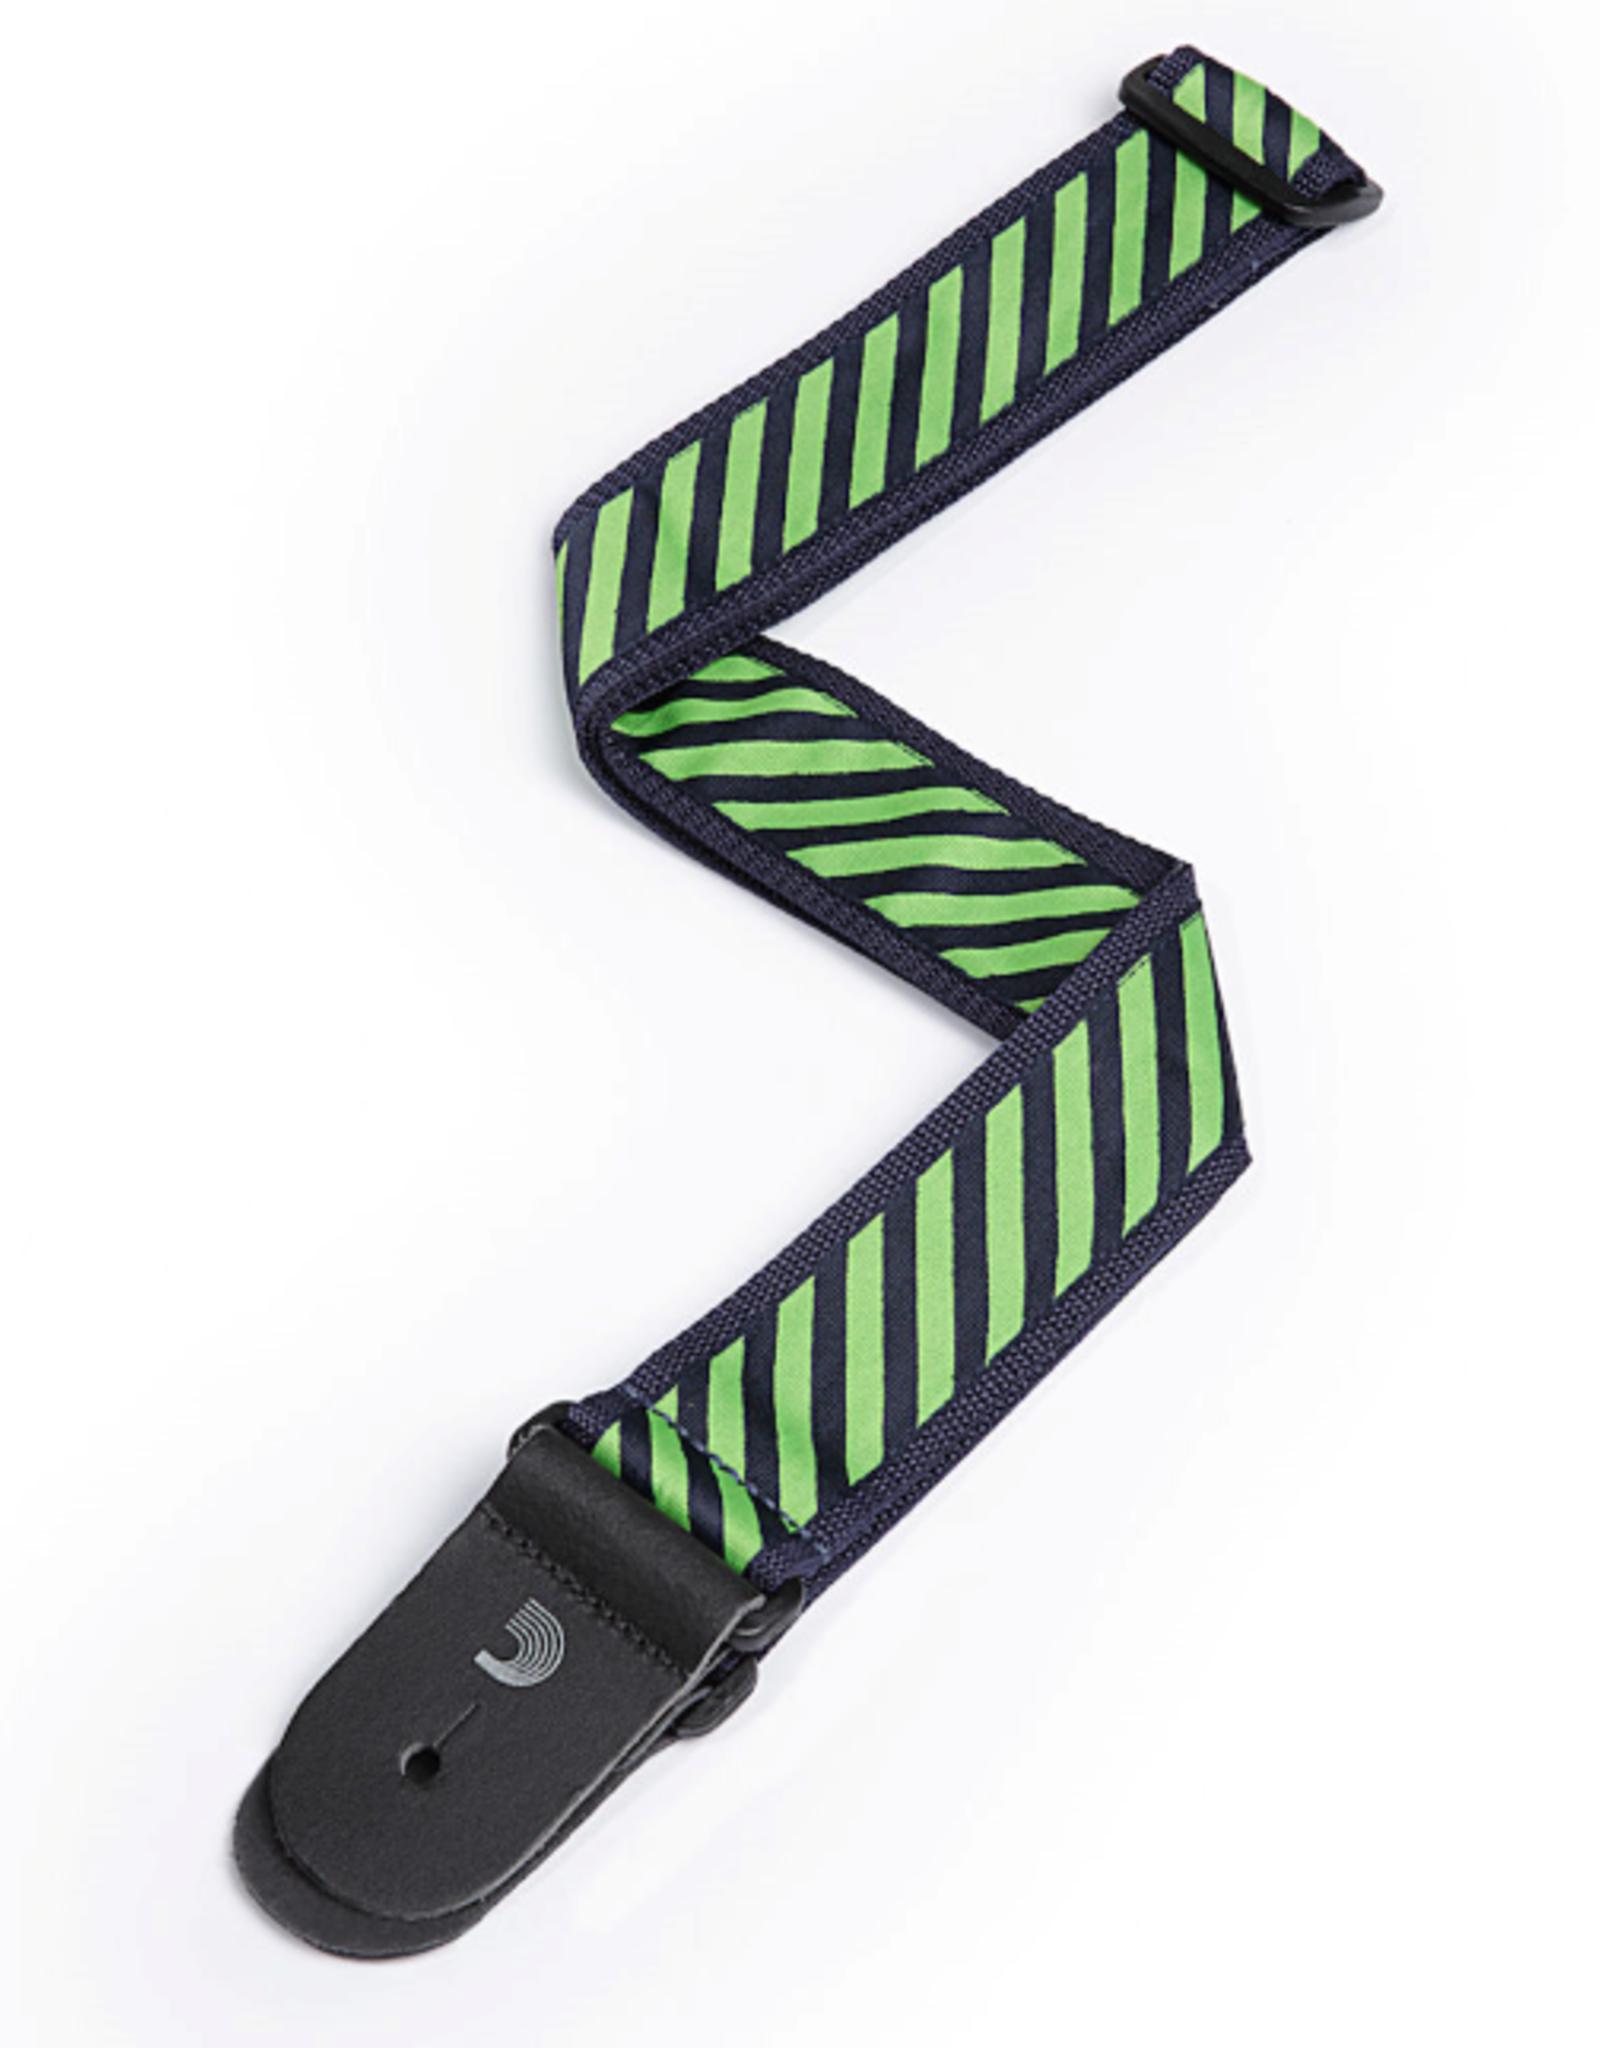 Planet Waves D'Addario Polypropylene Guitar Strap w/ Stripe Jacquard, Green